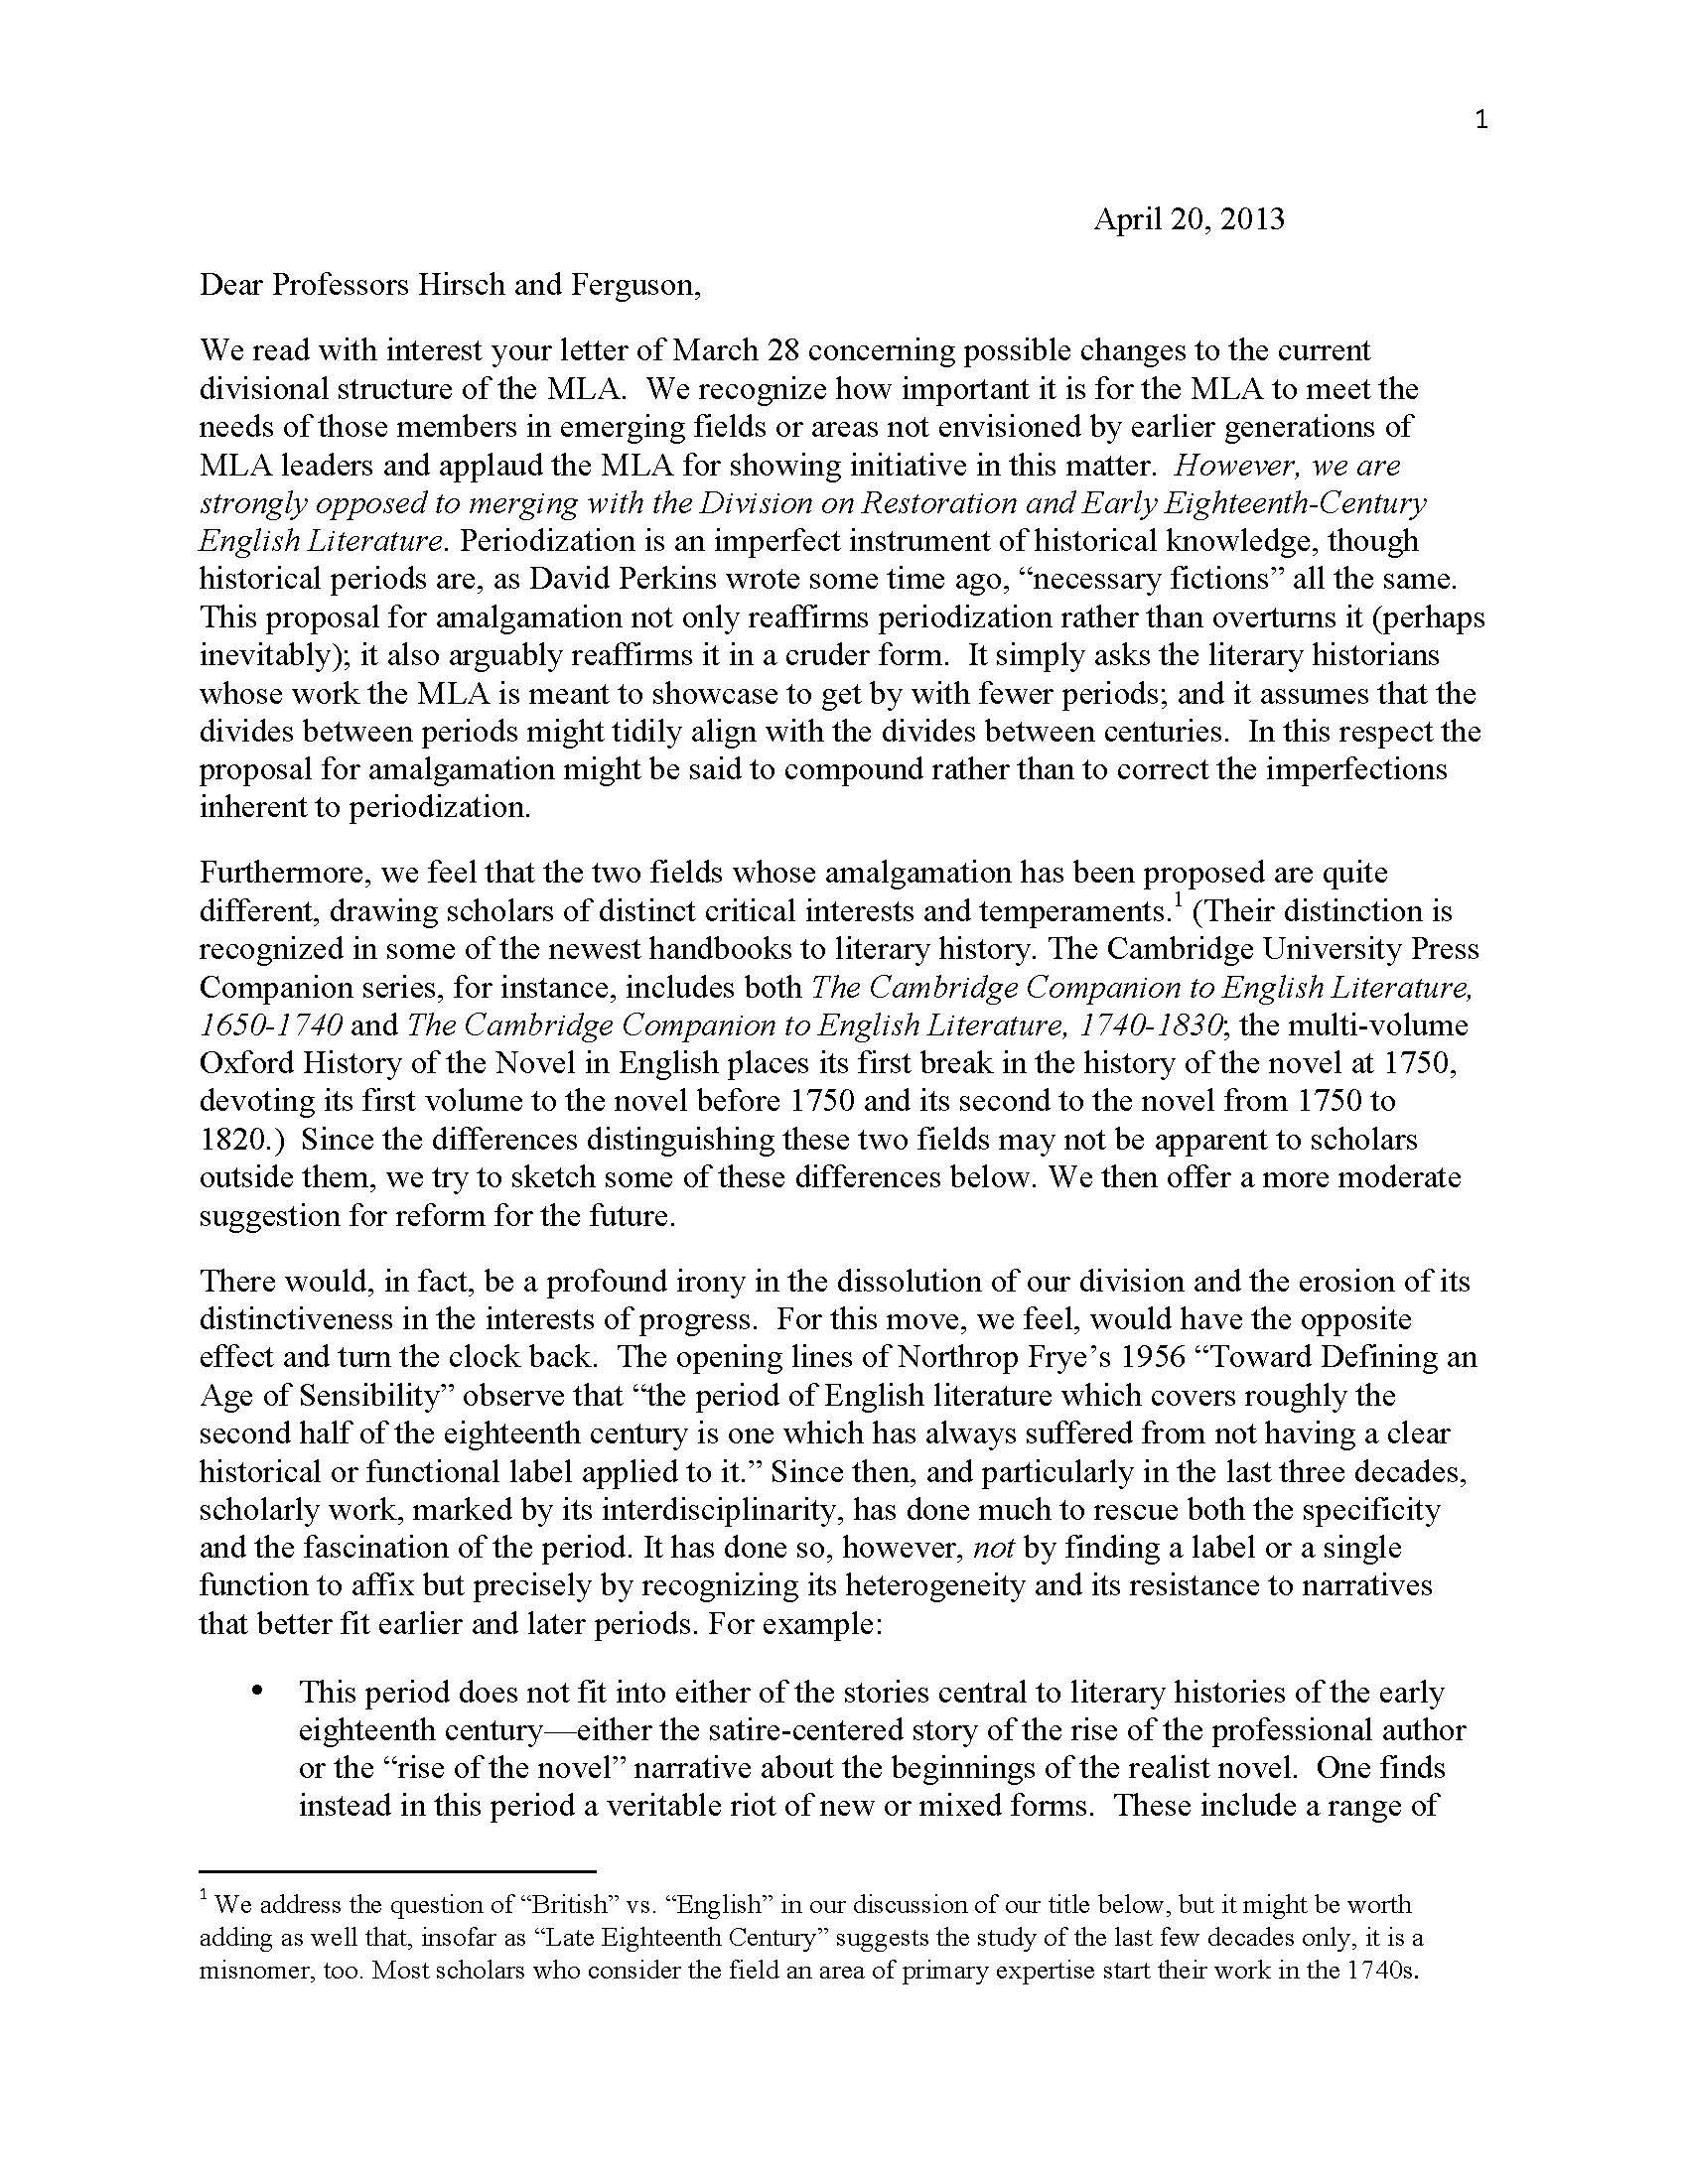 Novel Essay Example Apa Style Thesis Statement Ap Us History Exam